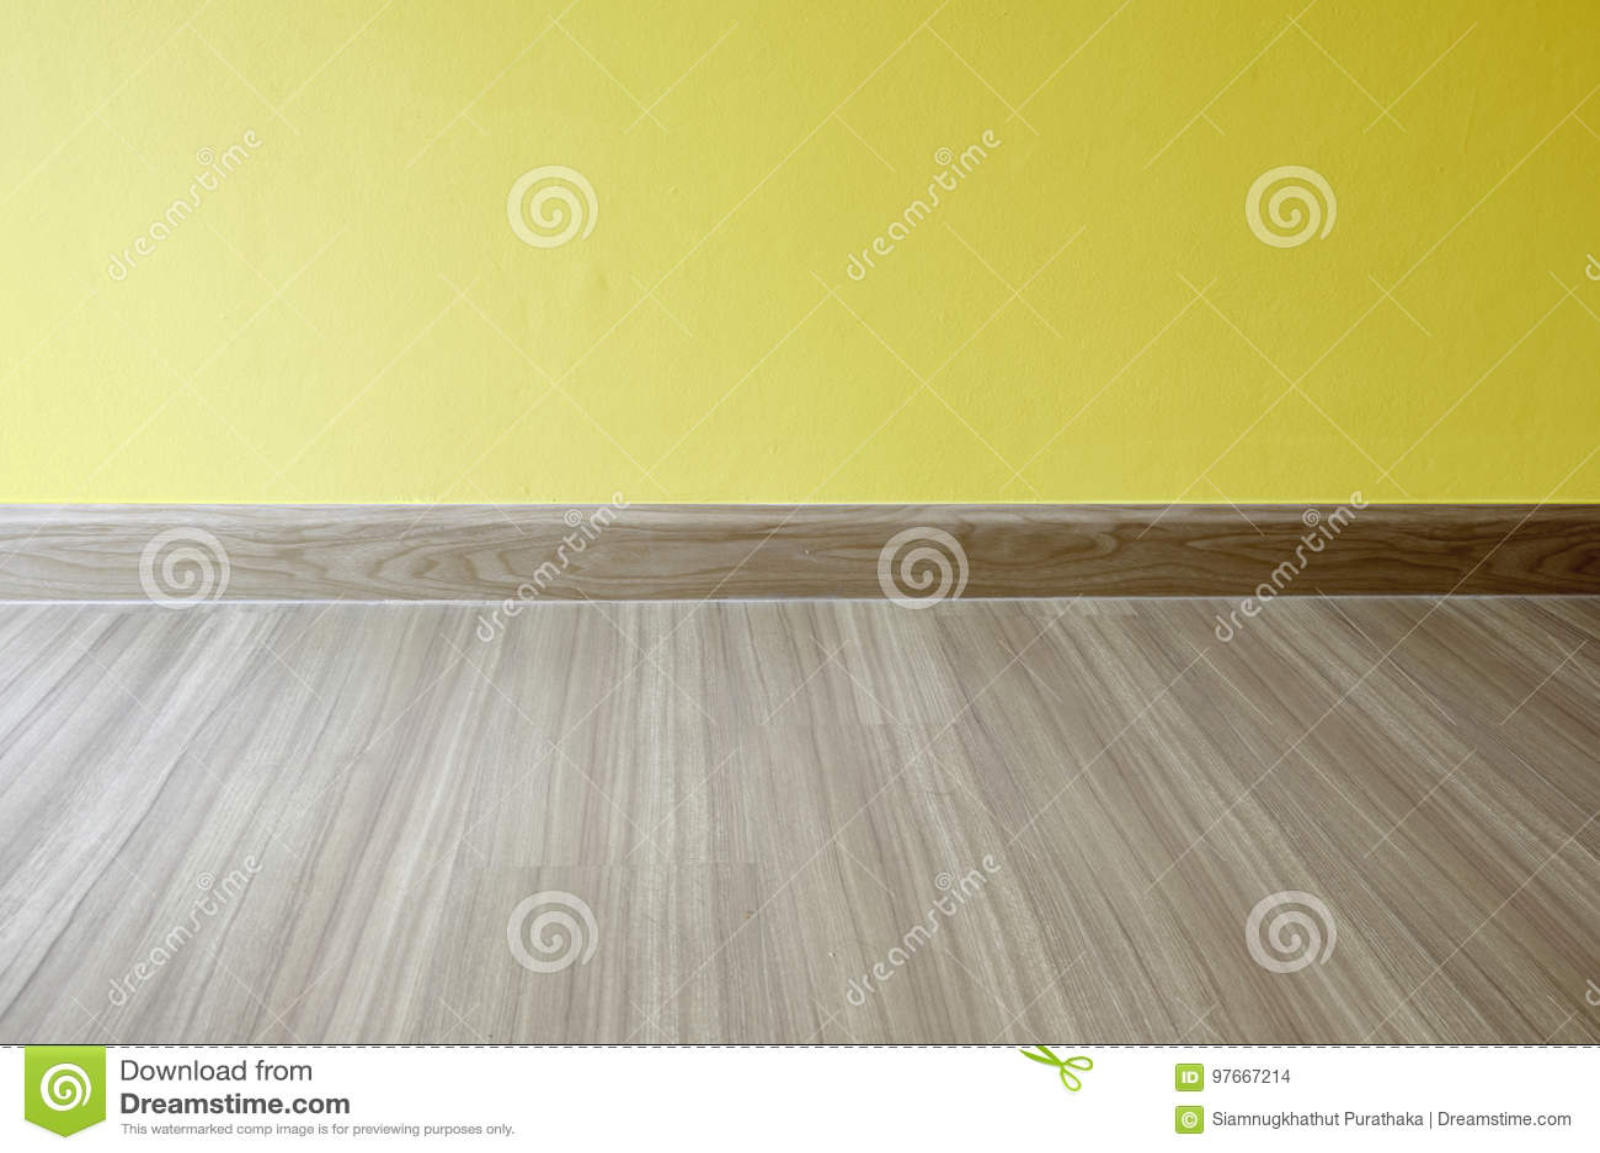 Laminaat Of Vinyl : Lege ruimte met eiken hout gelamineerde bevloering en onlangs